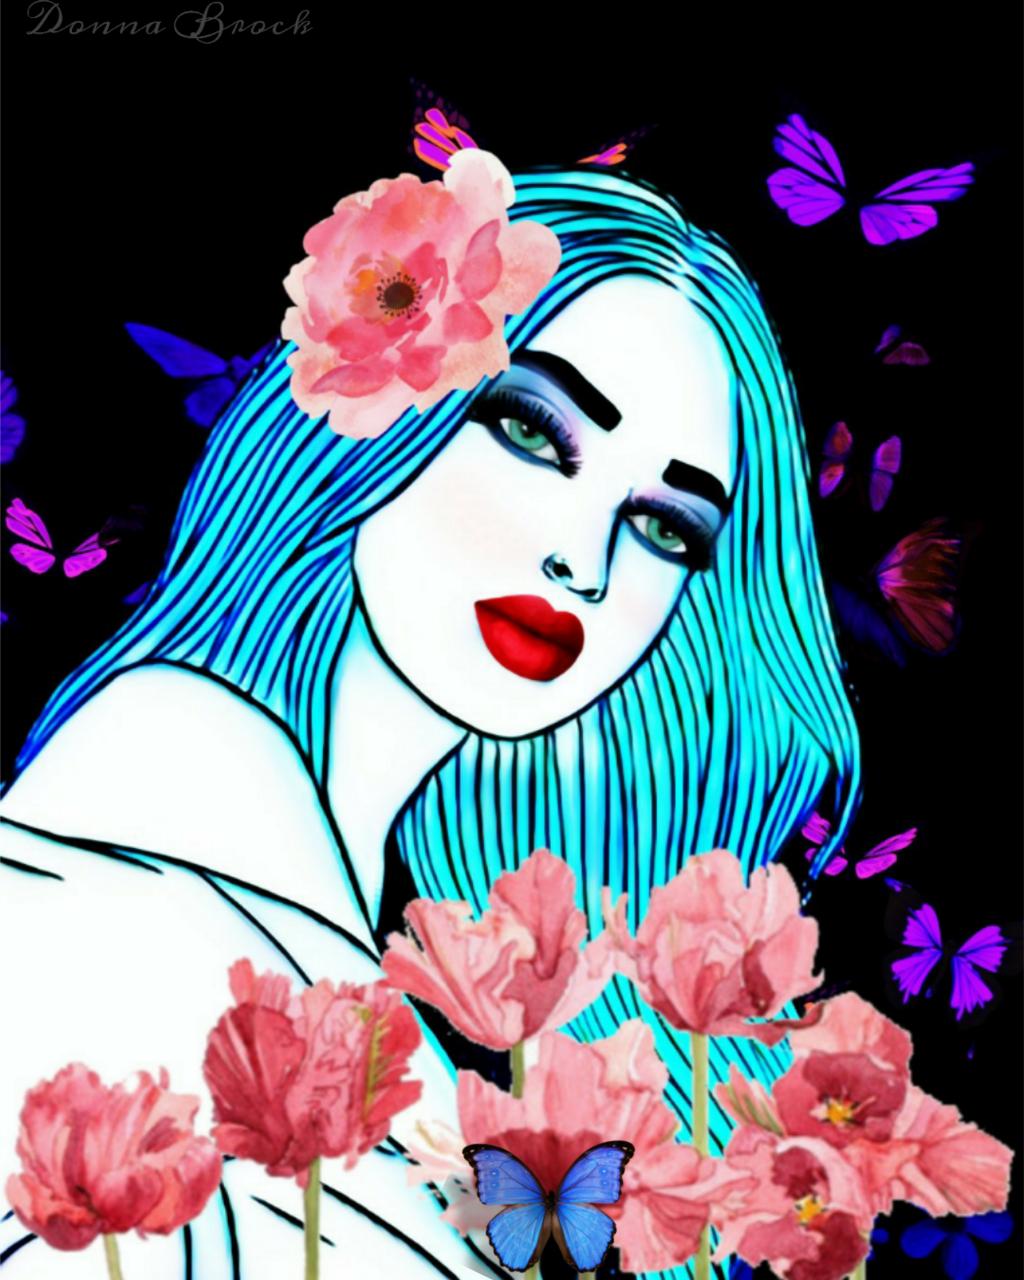 STRIKE A POSE. ...   #woman #pose  #freetoedit. #girl #drawing #flowers #flower. #butterflies. #butterfly  #ircpose